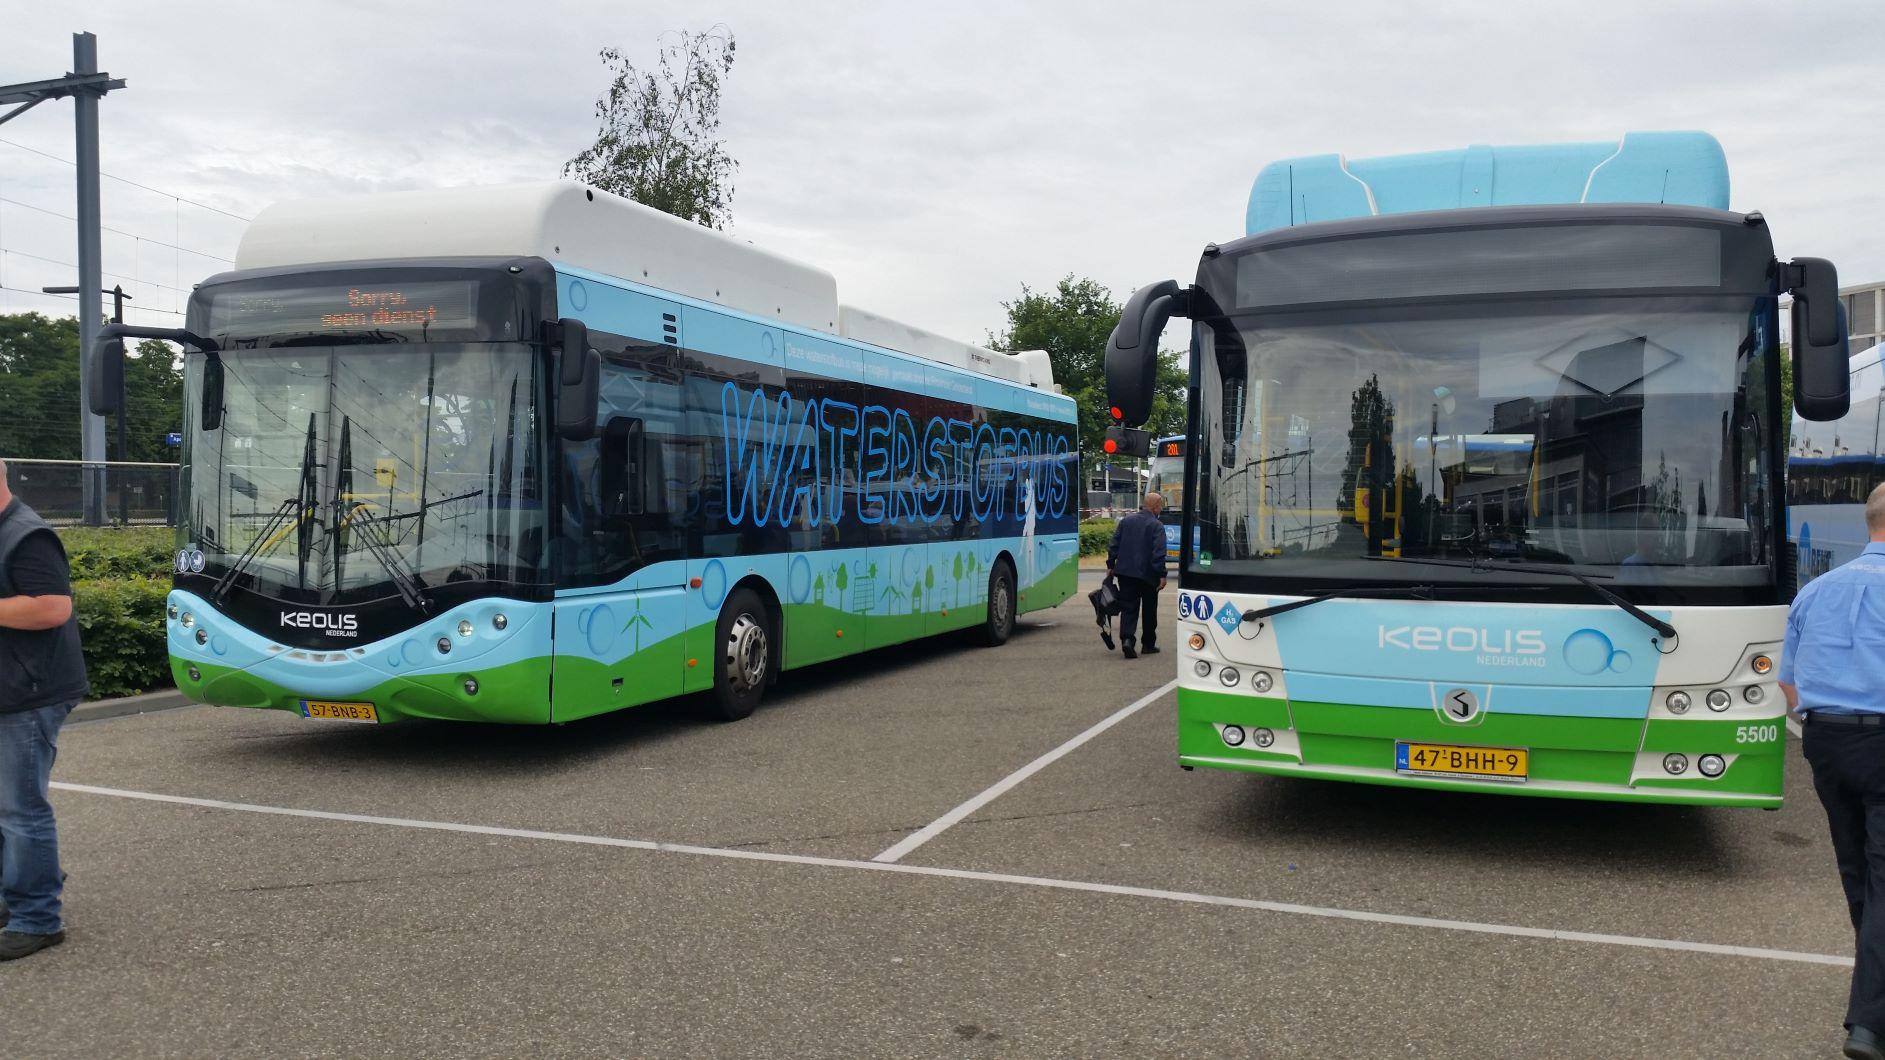 Waterstofbussen in Gelderse dienstregeling Keolis presteren uitstekend